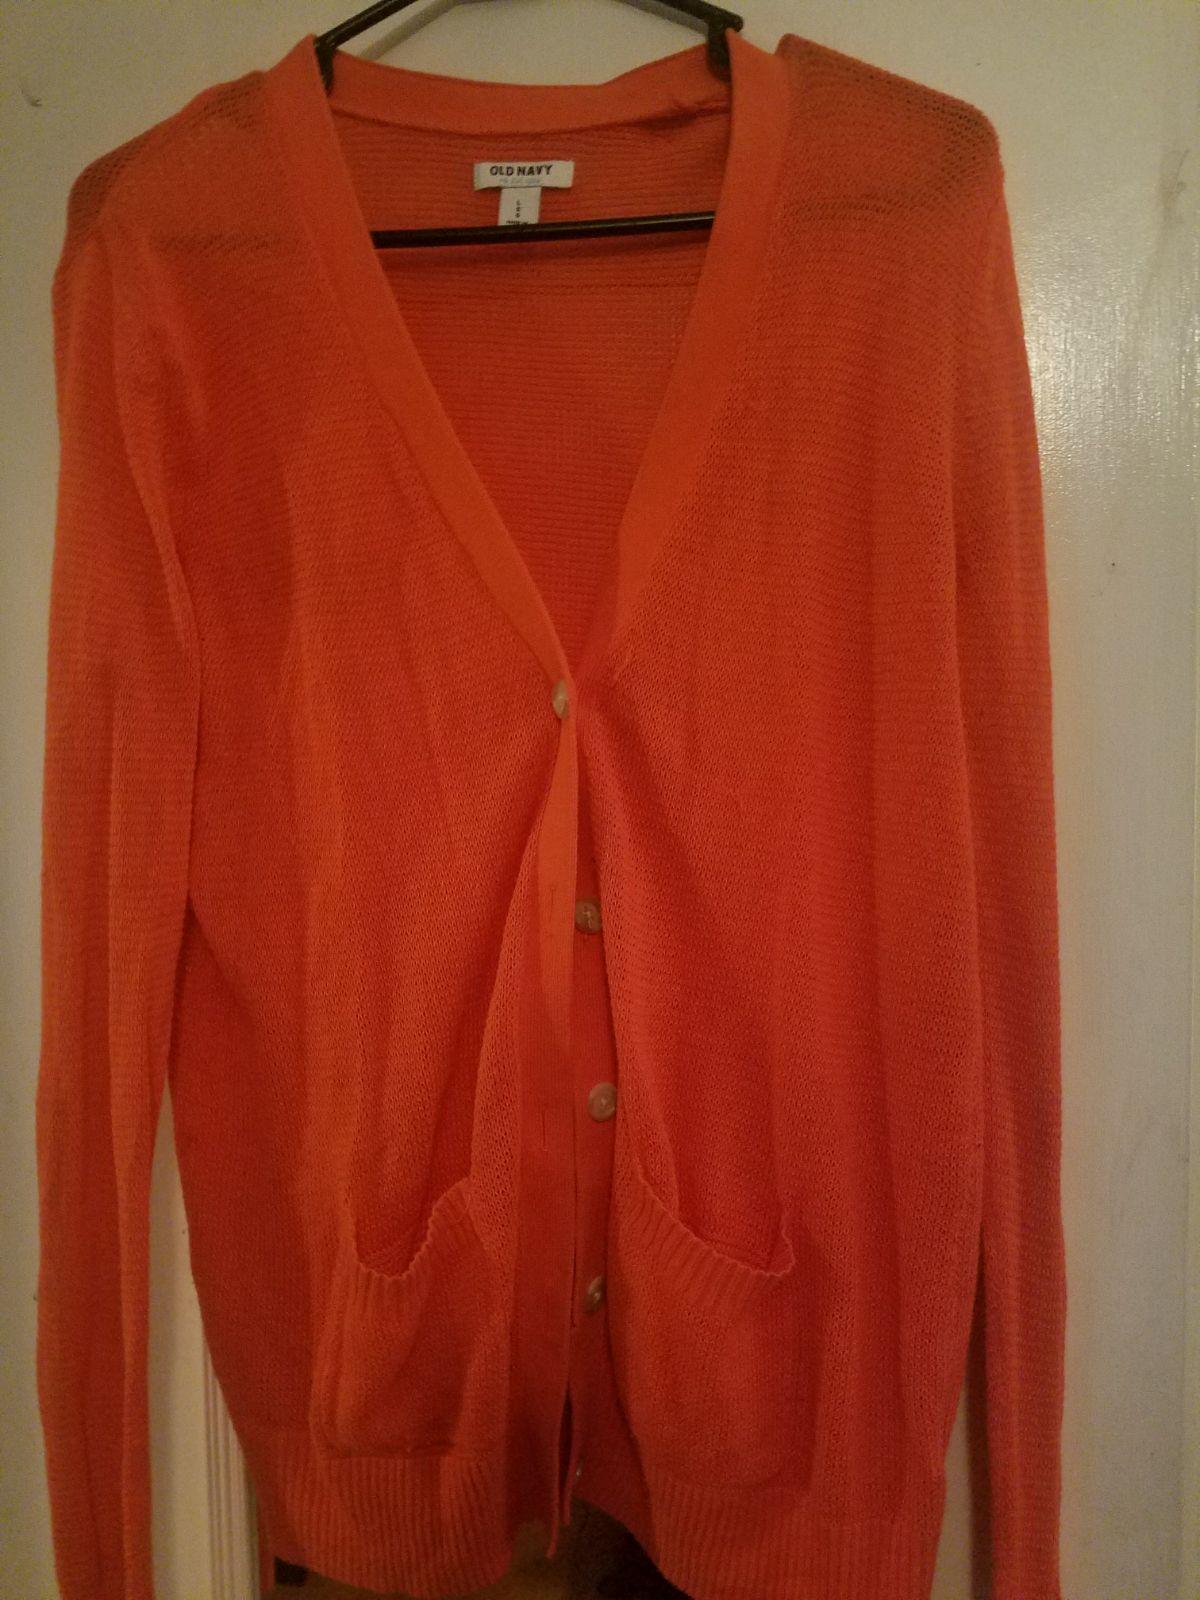 Orange Old navy cardigan size large - Mercari: BUY & SELL THINGS ...